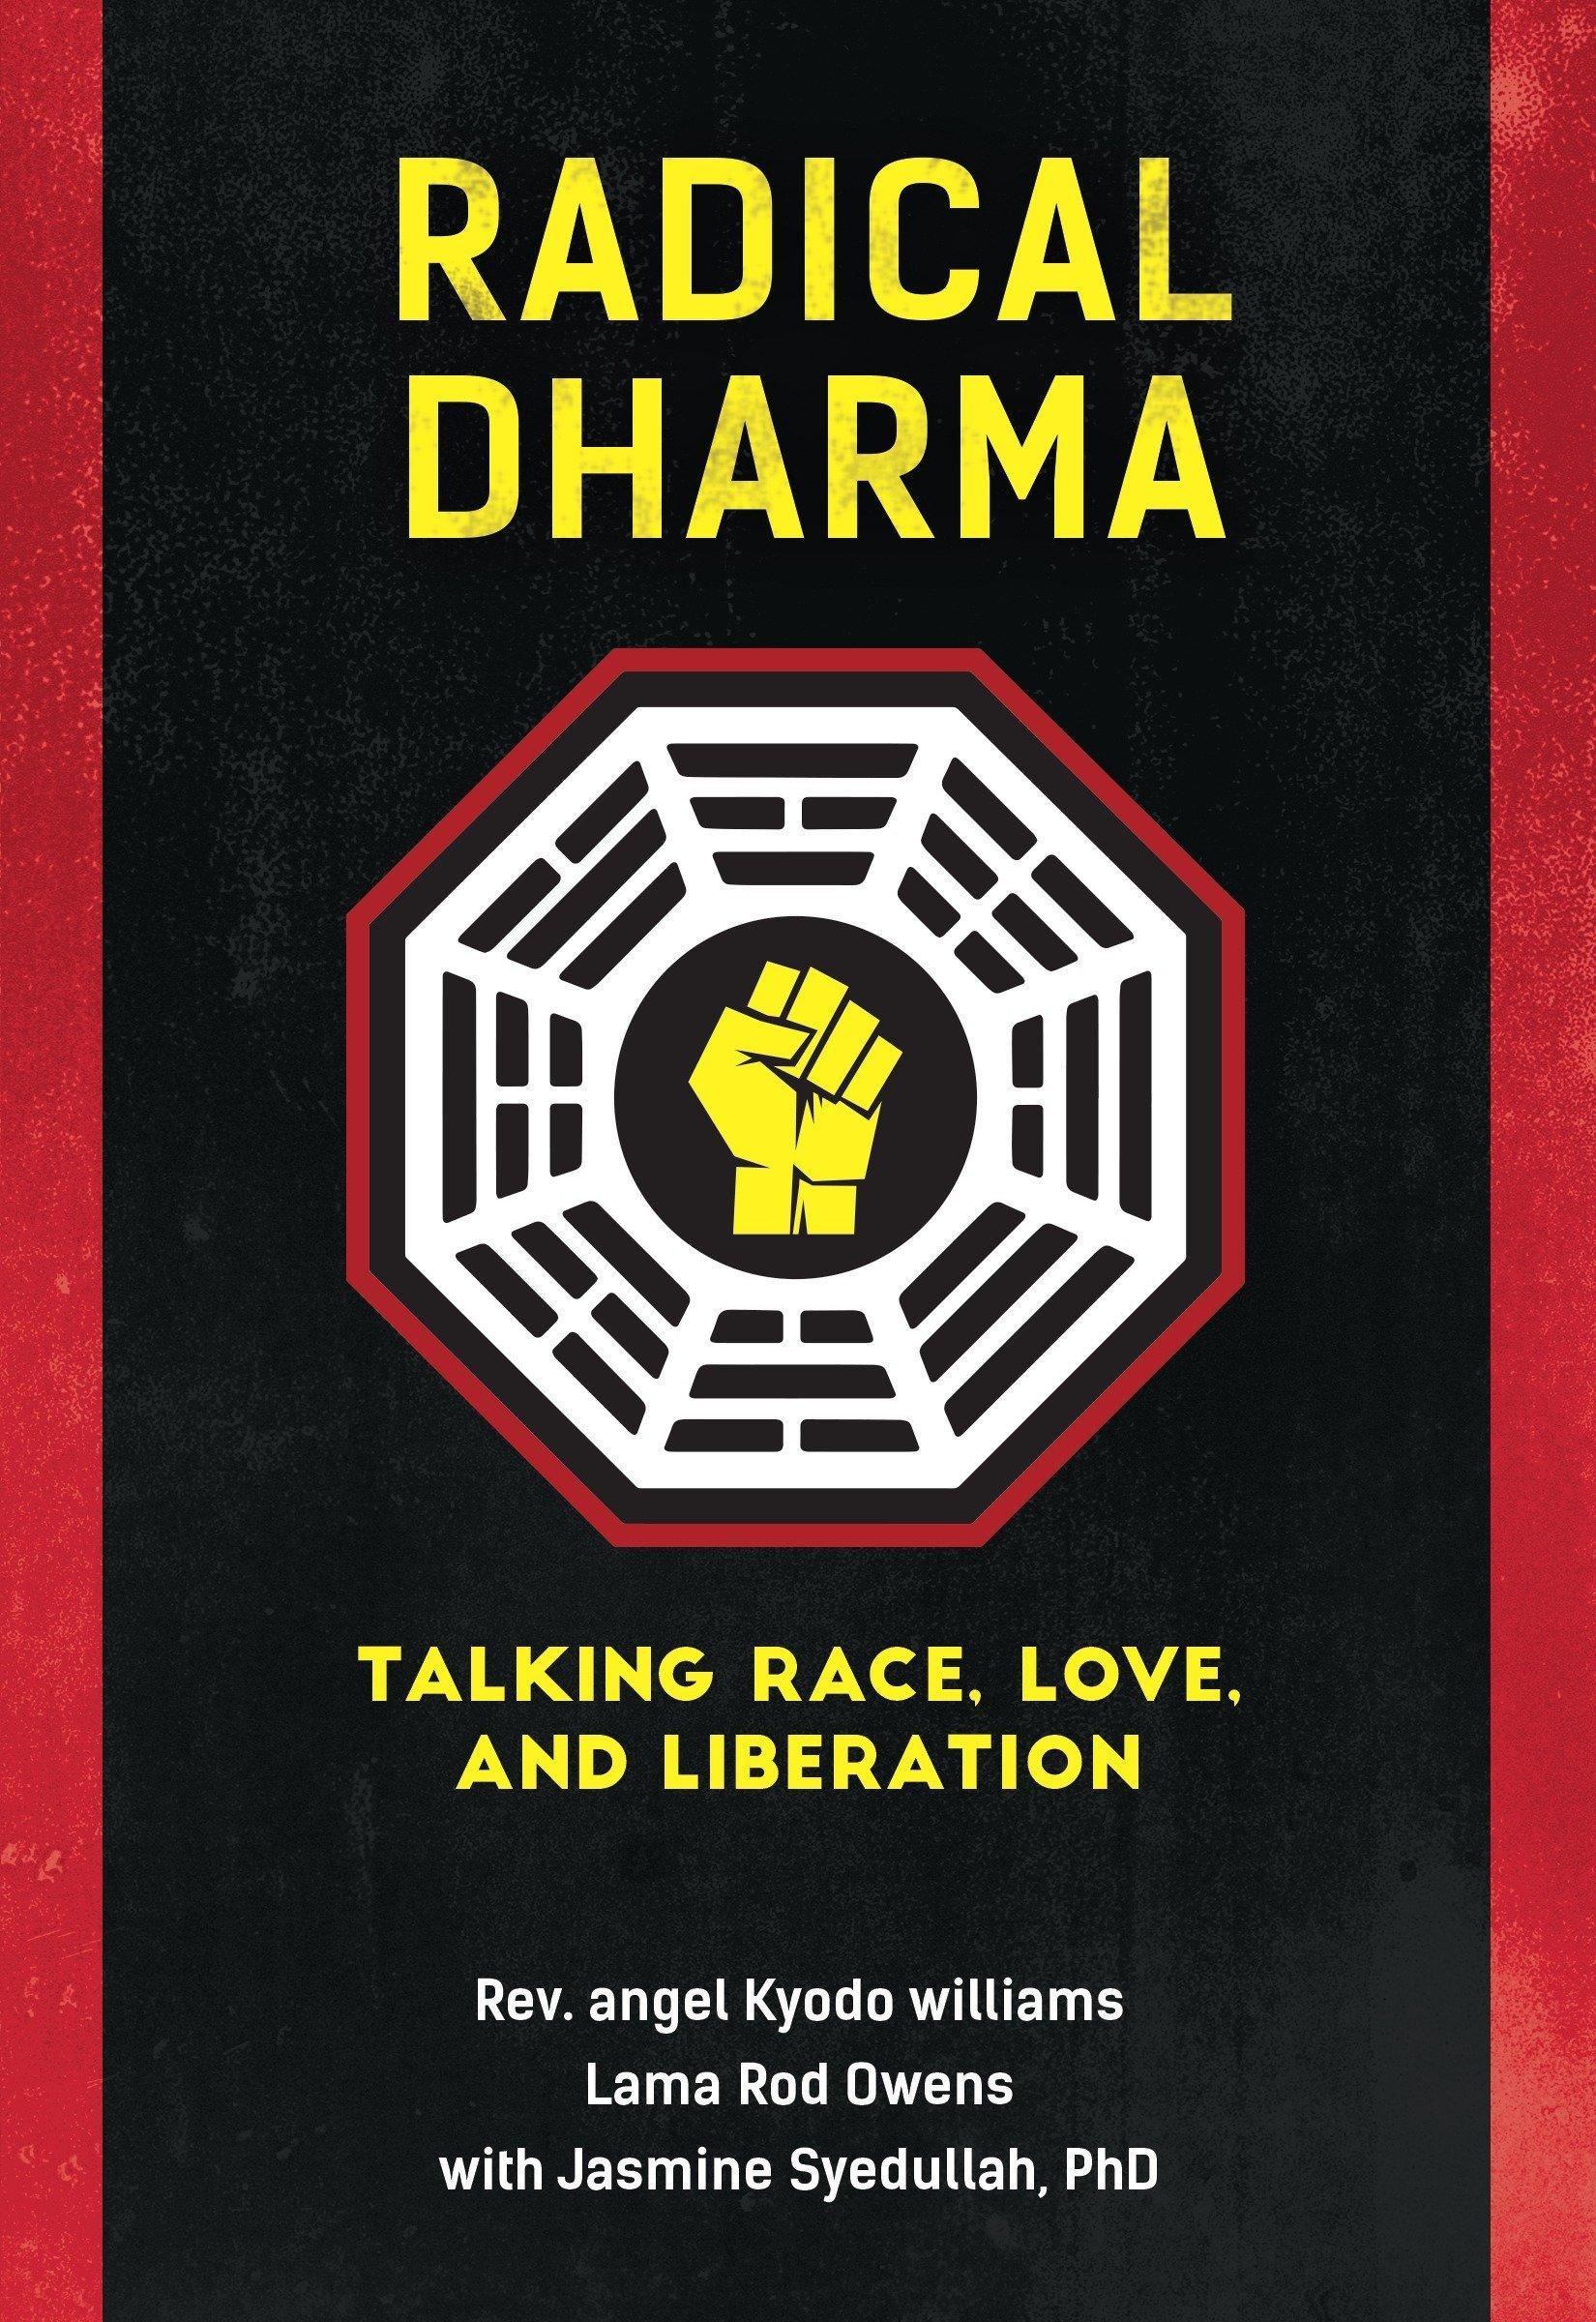 Amazon.com: Radical Dharma: Talking Race, Love, and ...